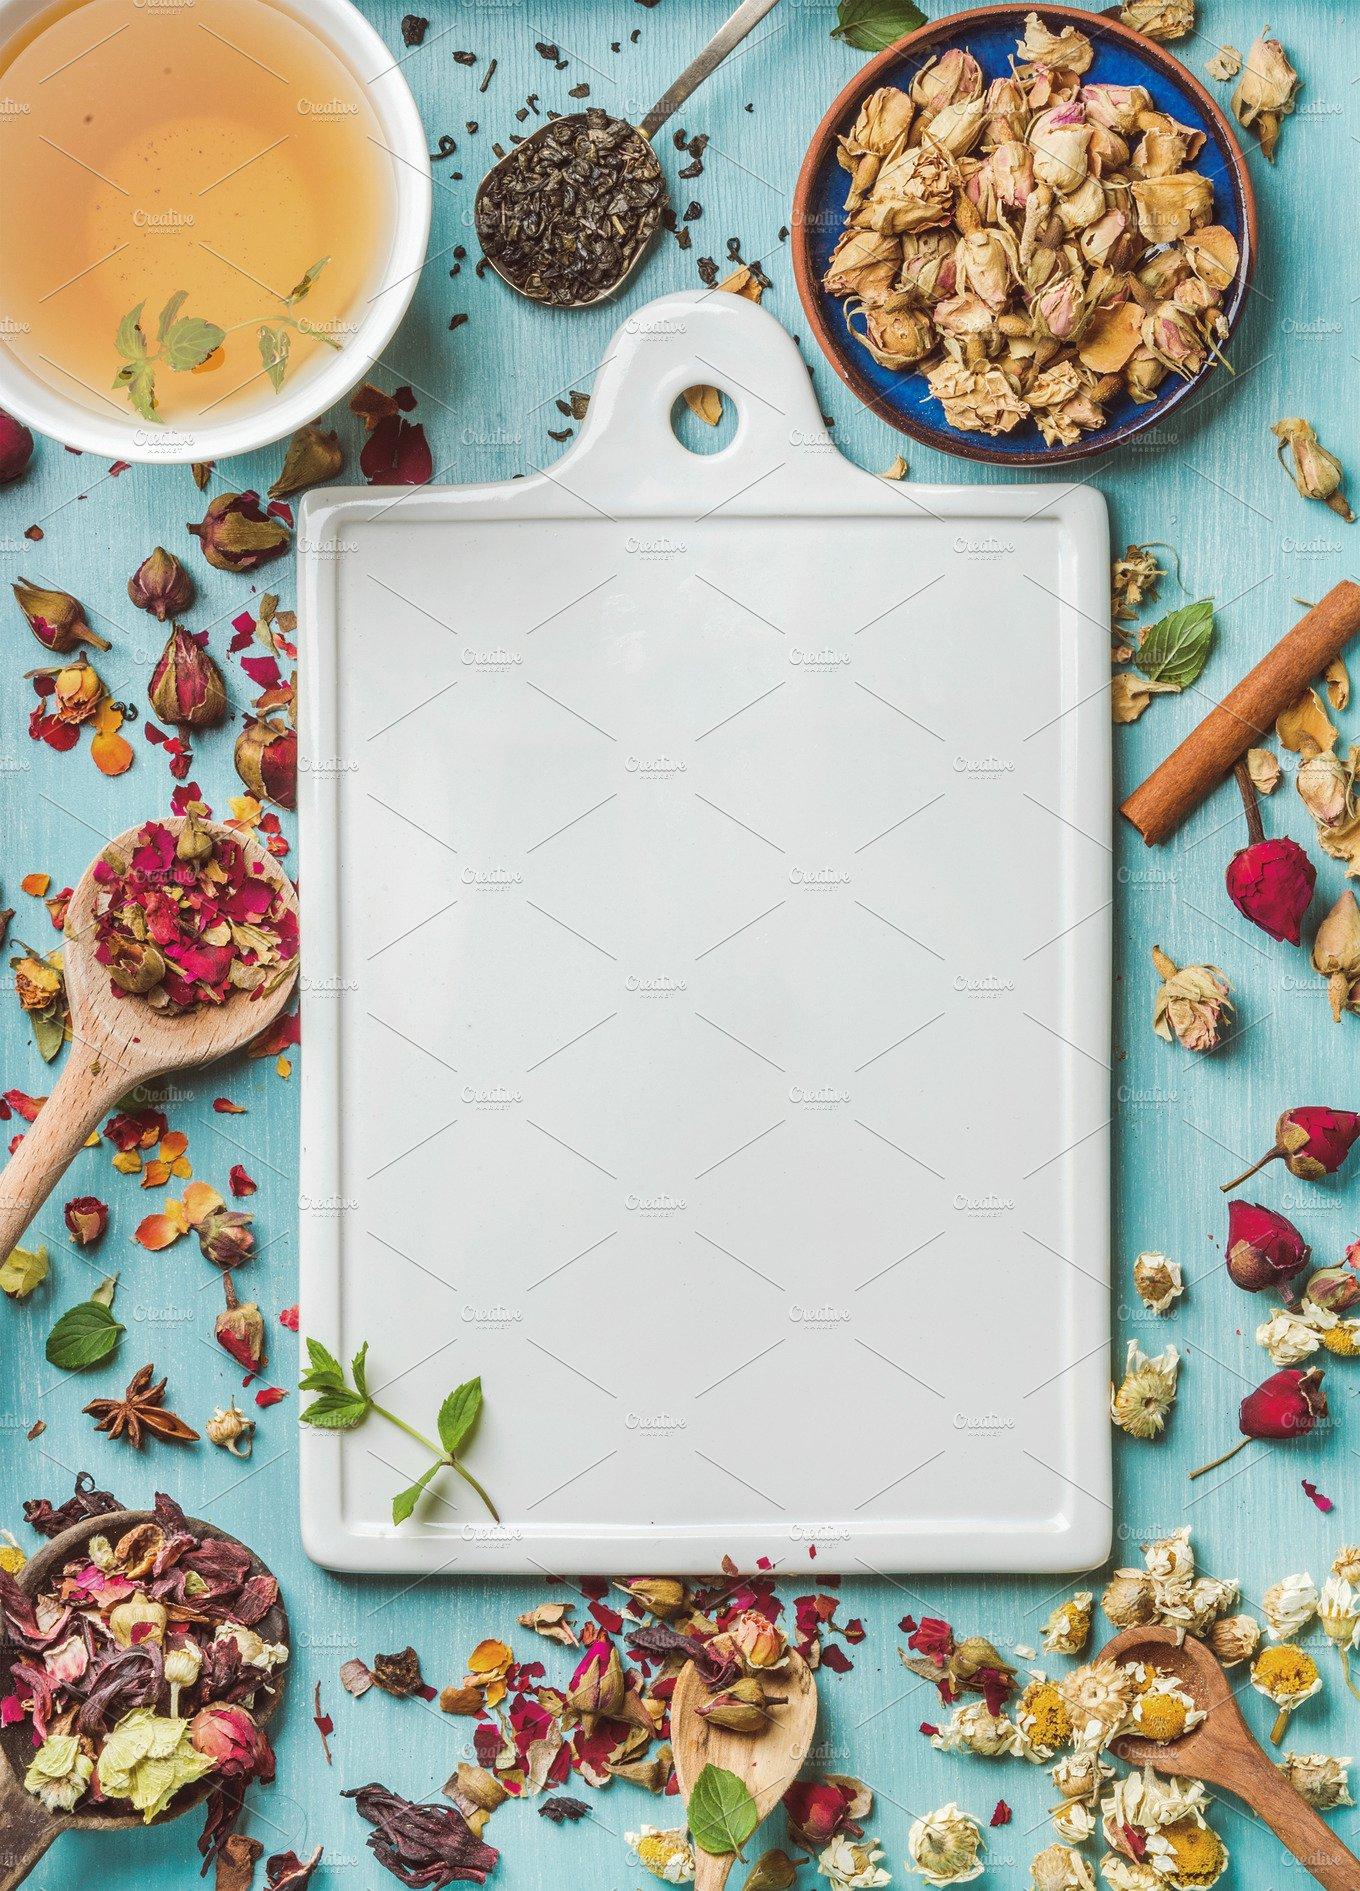 Cup of healthy herbal tea ~ Food & Drink Photos ~ Creative